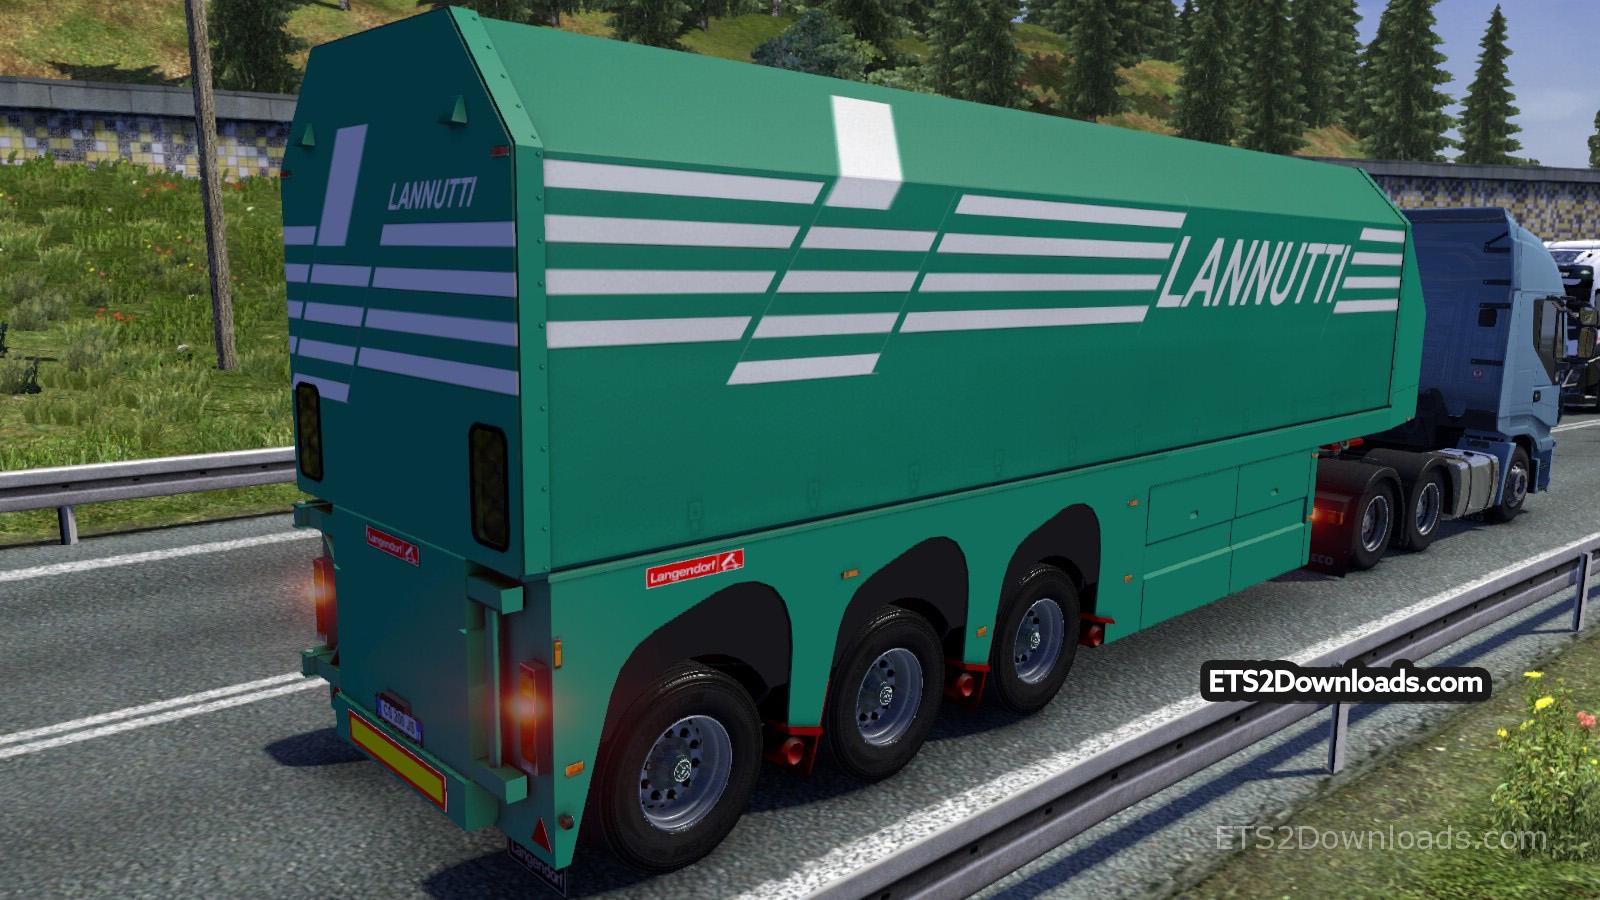 lannutti-glass-trailer-1